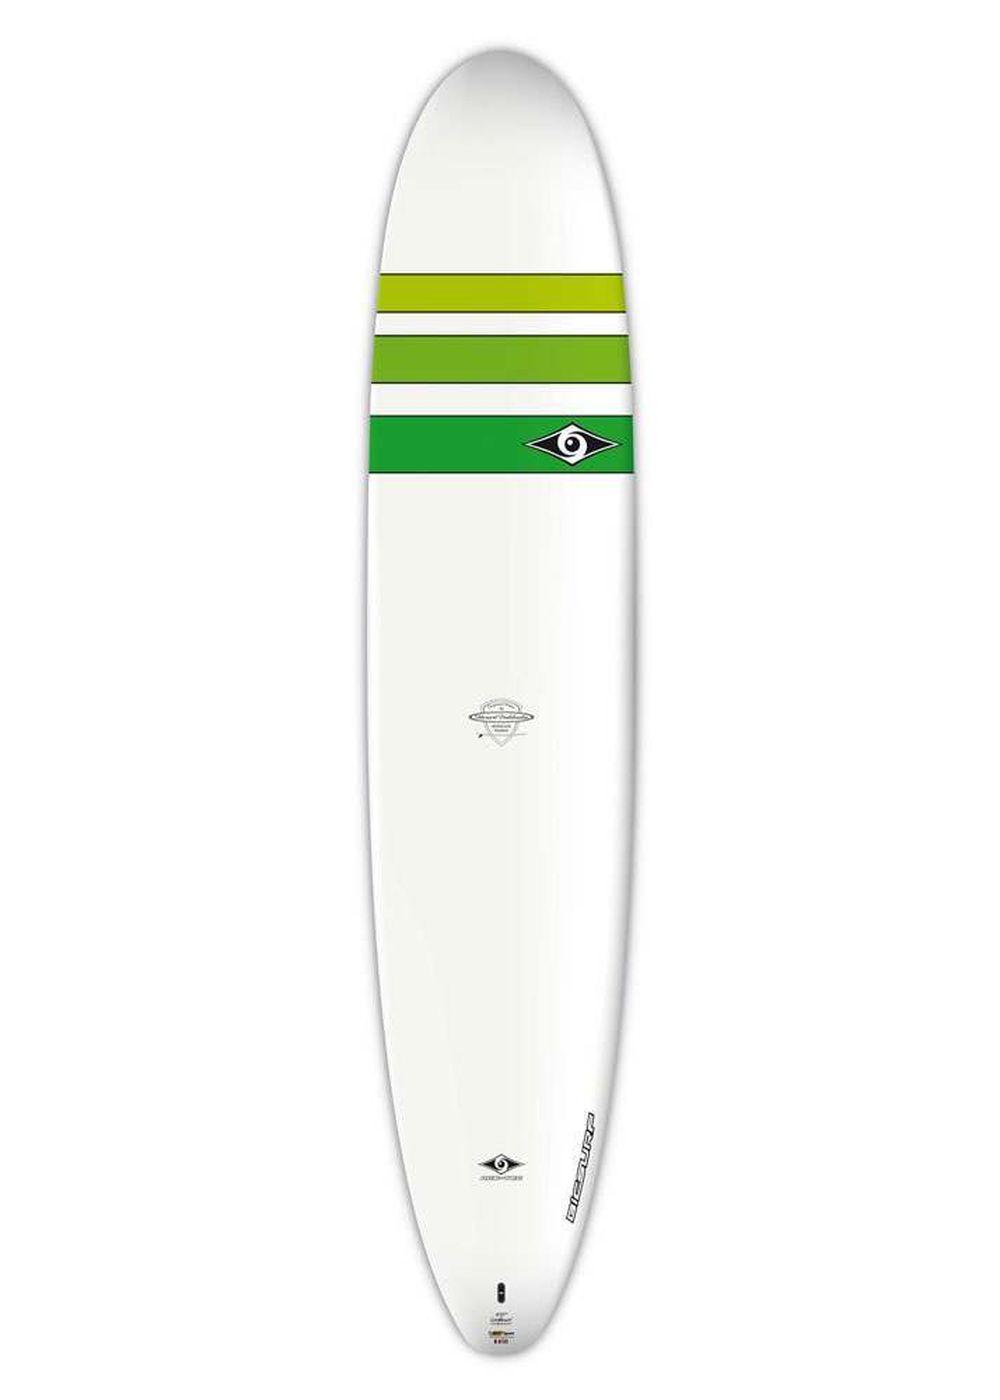 BIC CLASSIC LONGBOARD SURFBOARD 9ft 0